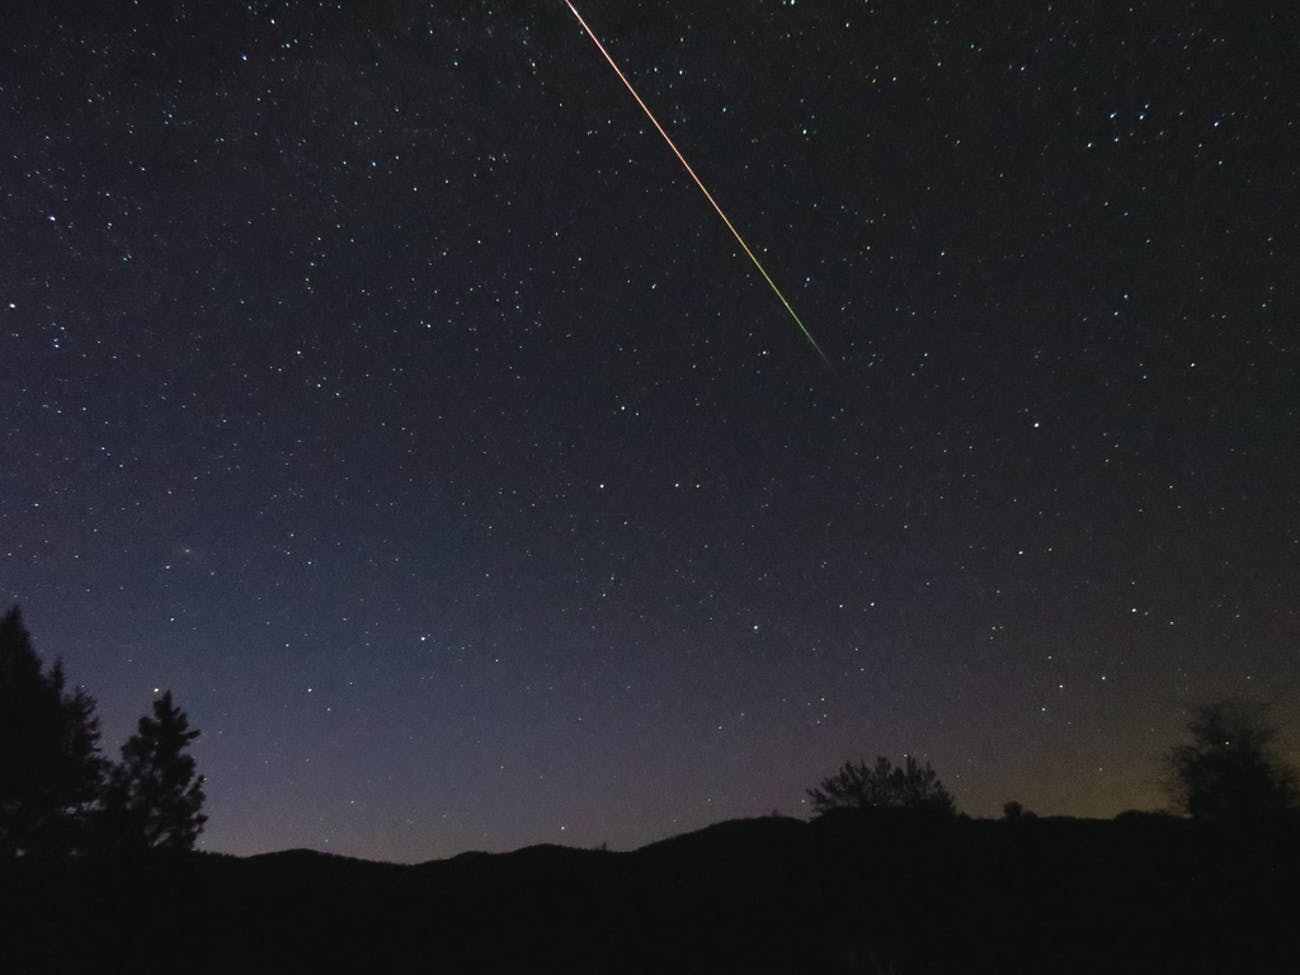 Long trails from the Eta Aquariid meteor shower